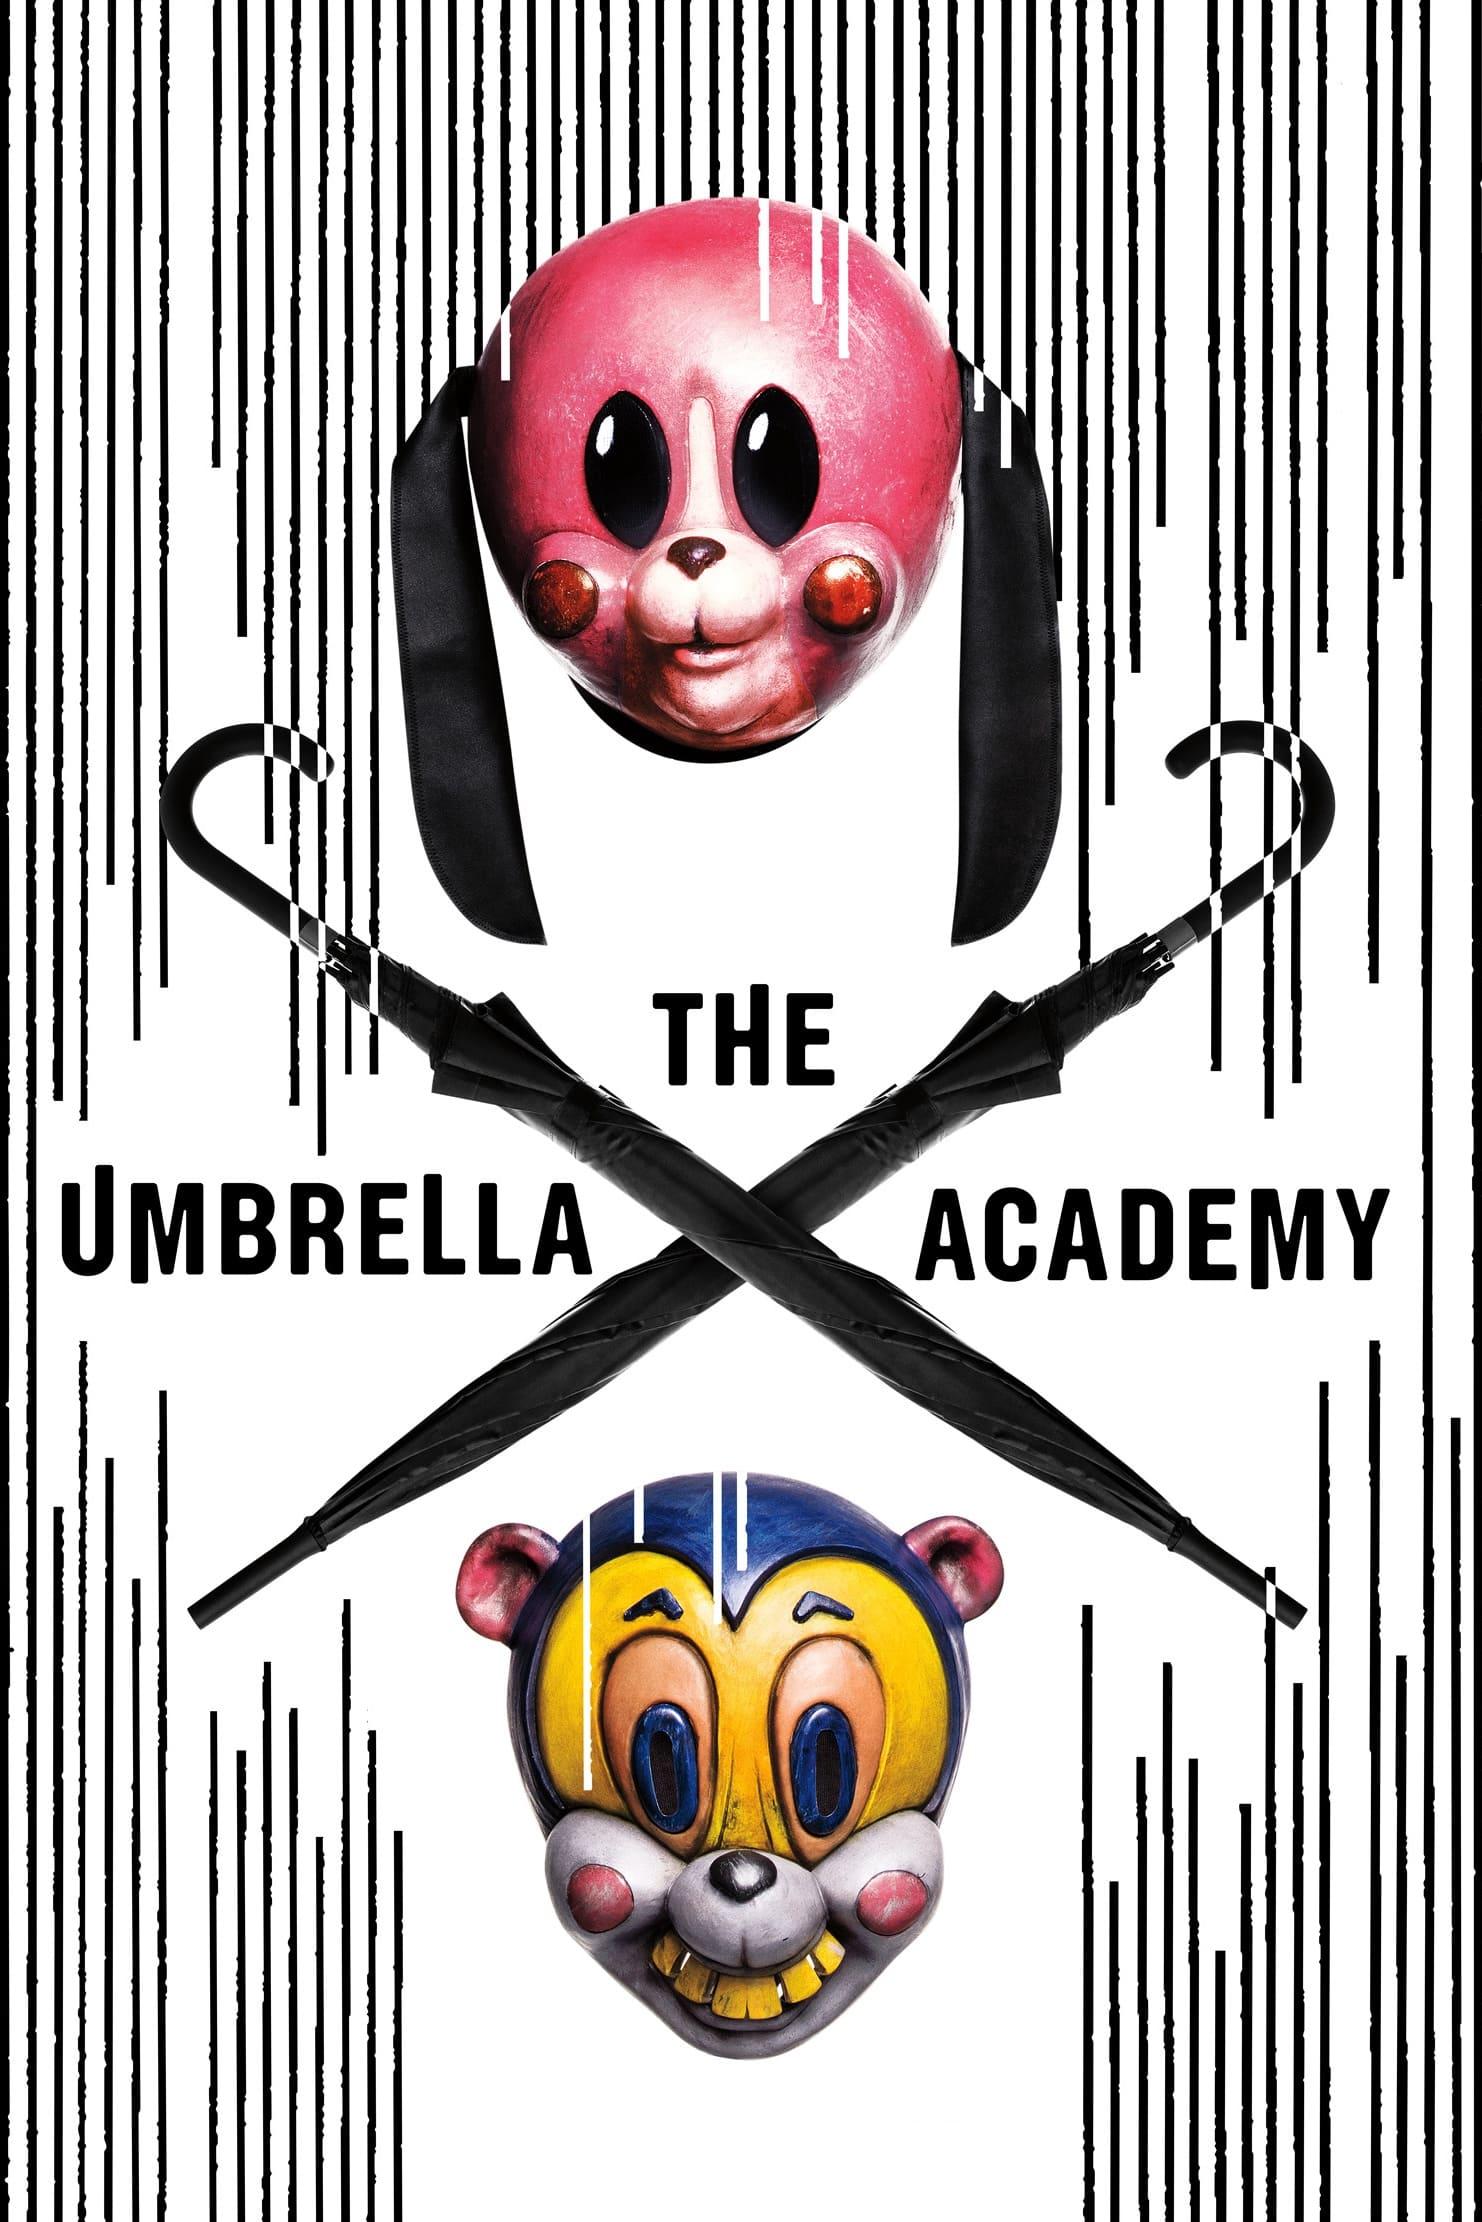 The Umbrella Academy 2019